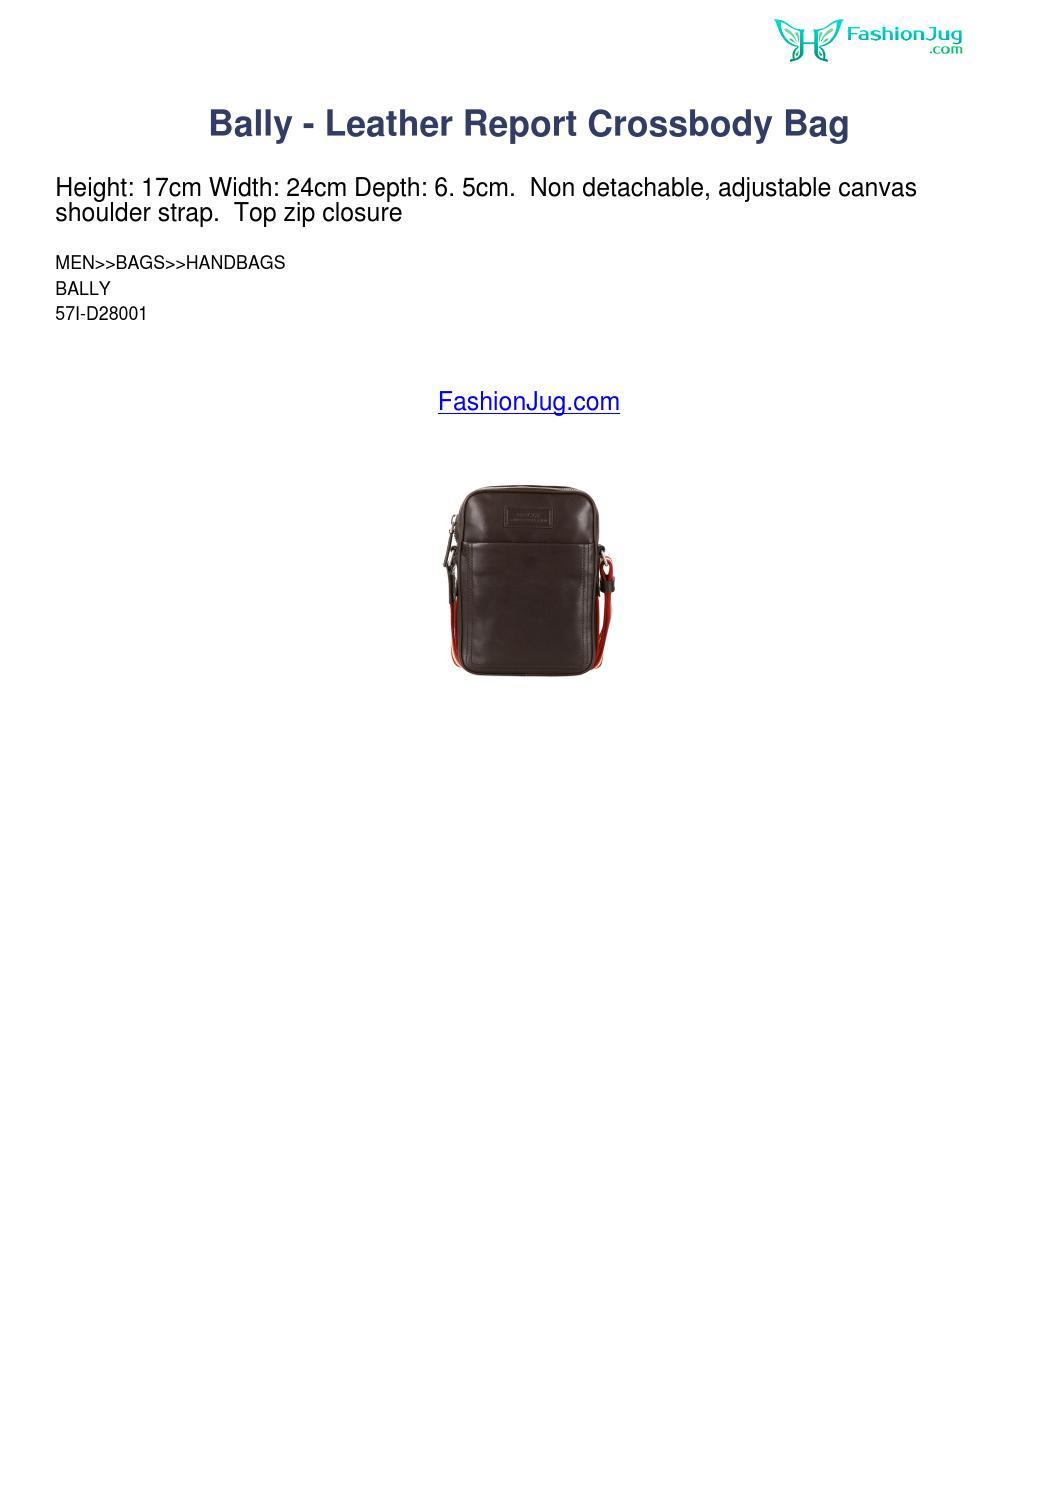 telescopio Biblioteca troncal su  Bally leather report crossbody bag fashionjug review 2261 by cakertiese -  issuu